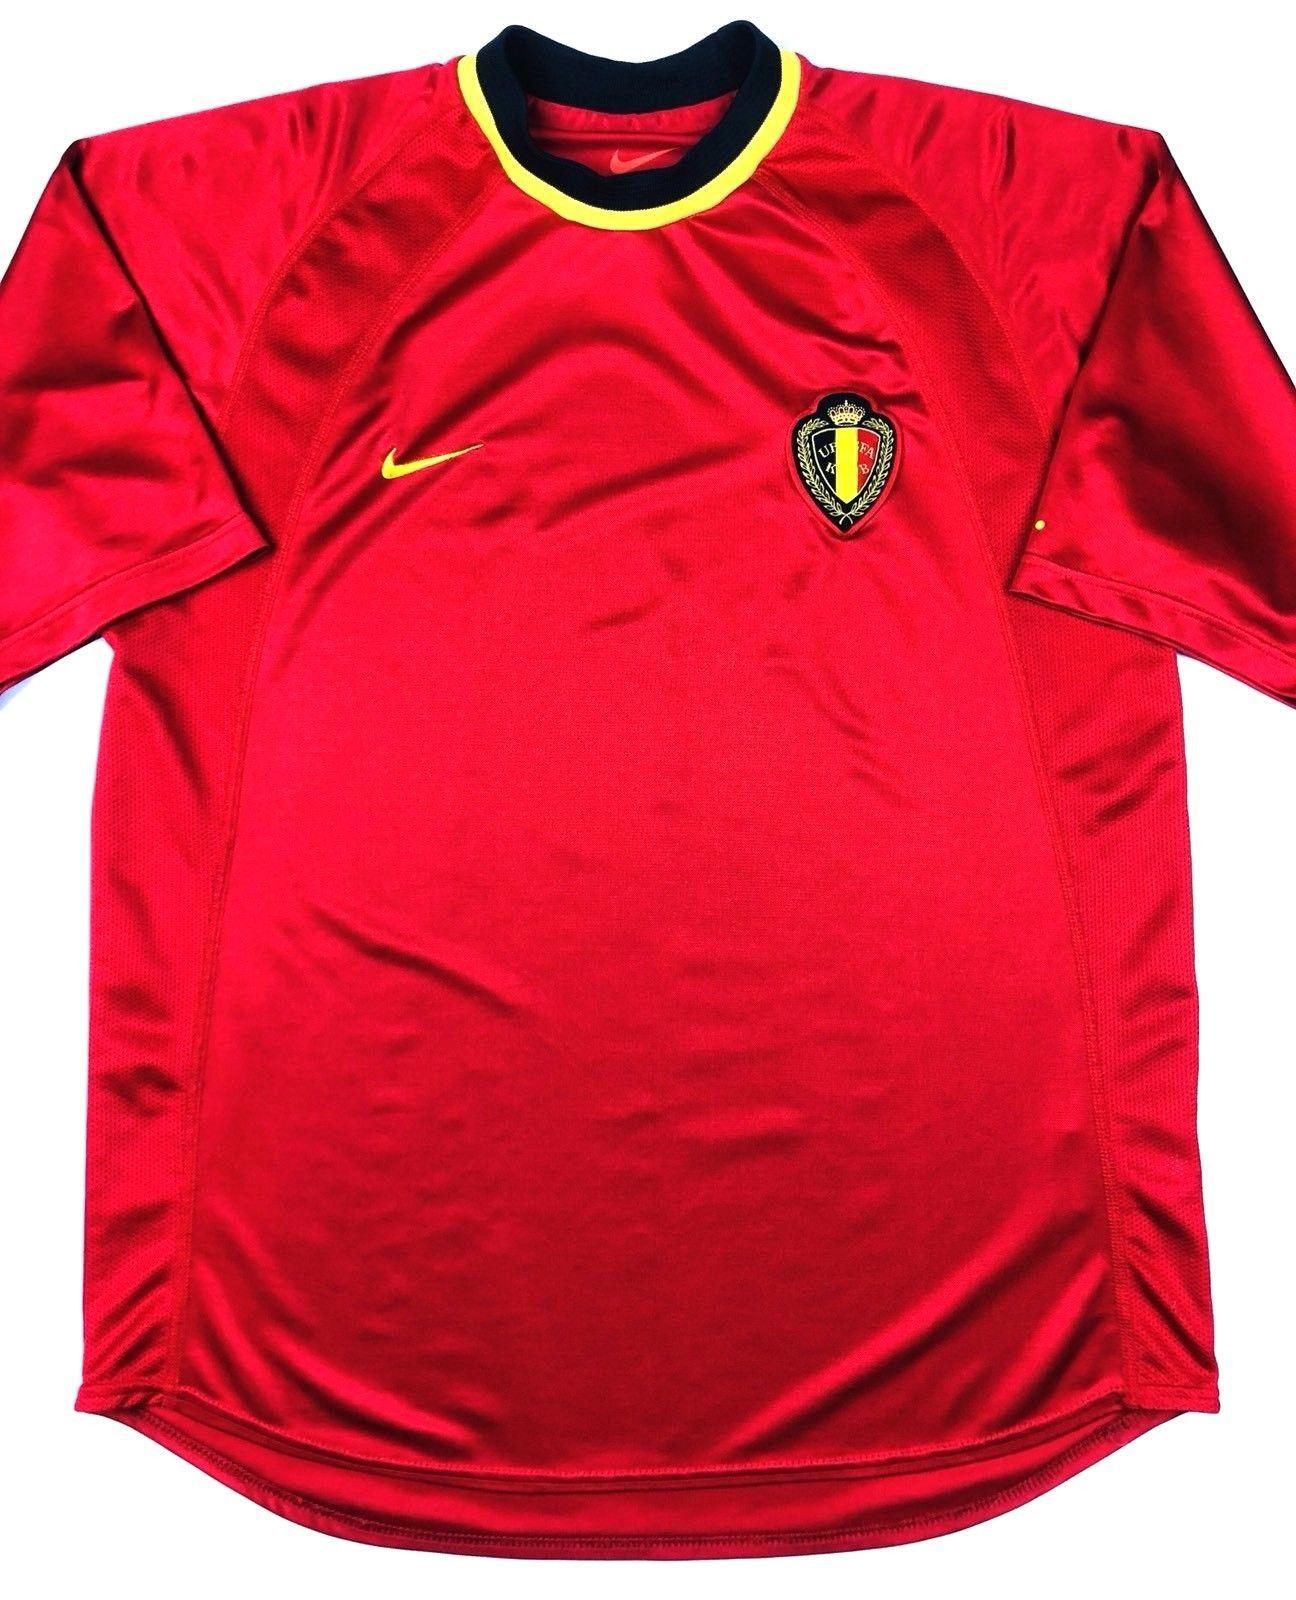 Nike BELGIUM Euro 2000 M Home Soccer Jersey Football Shirt KBVB URBSFA  Belgique (eBay Link) ab34f4966